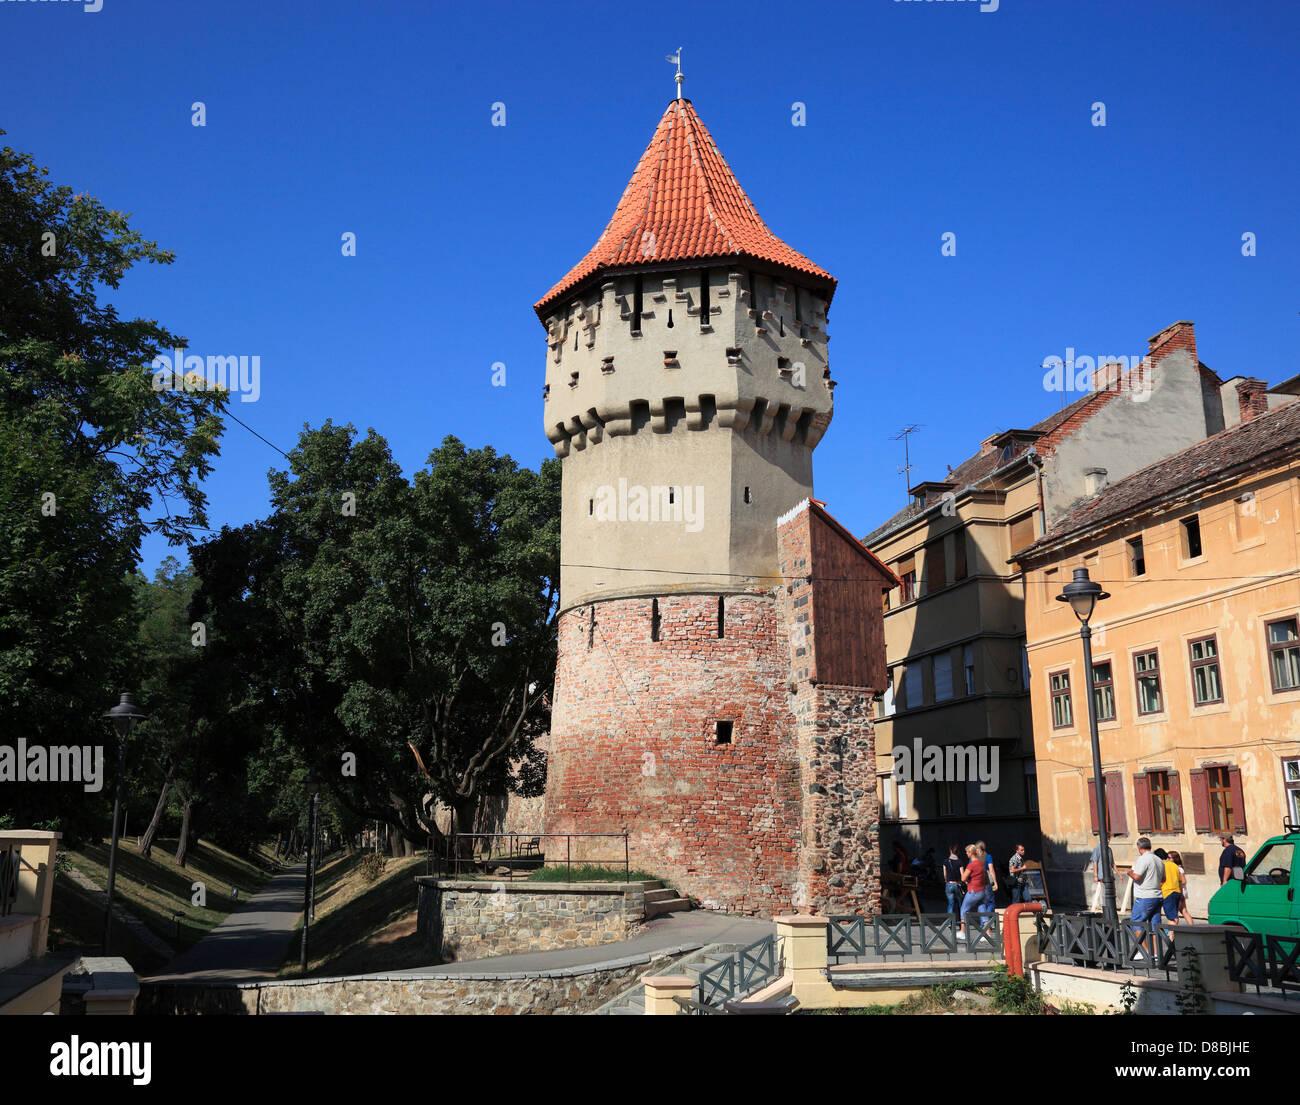 Tower of the Haller Bastion, Sibiu, Romania - Stock Image